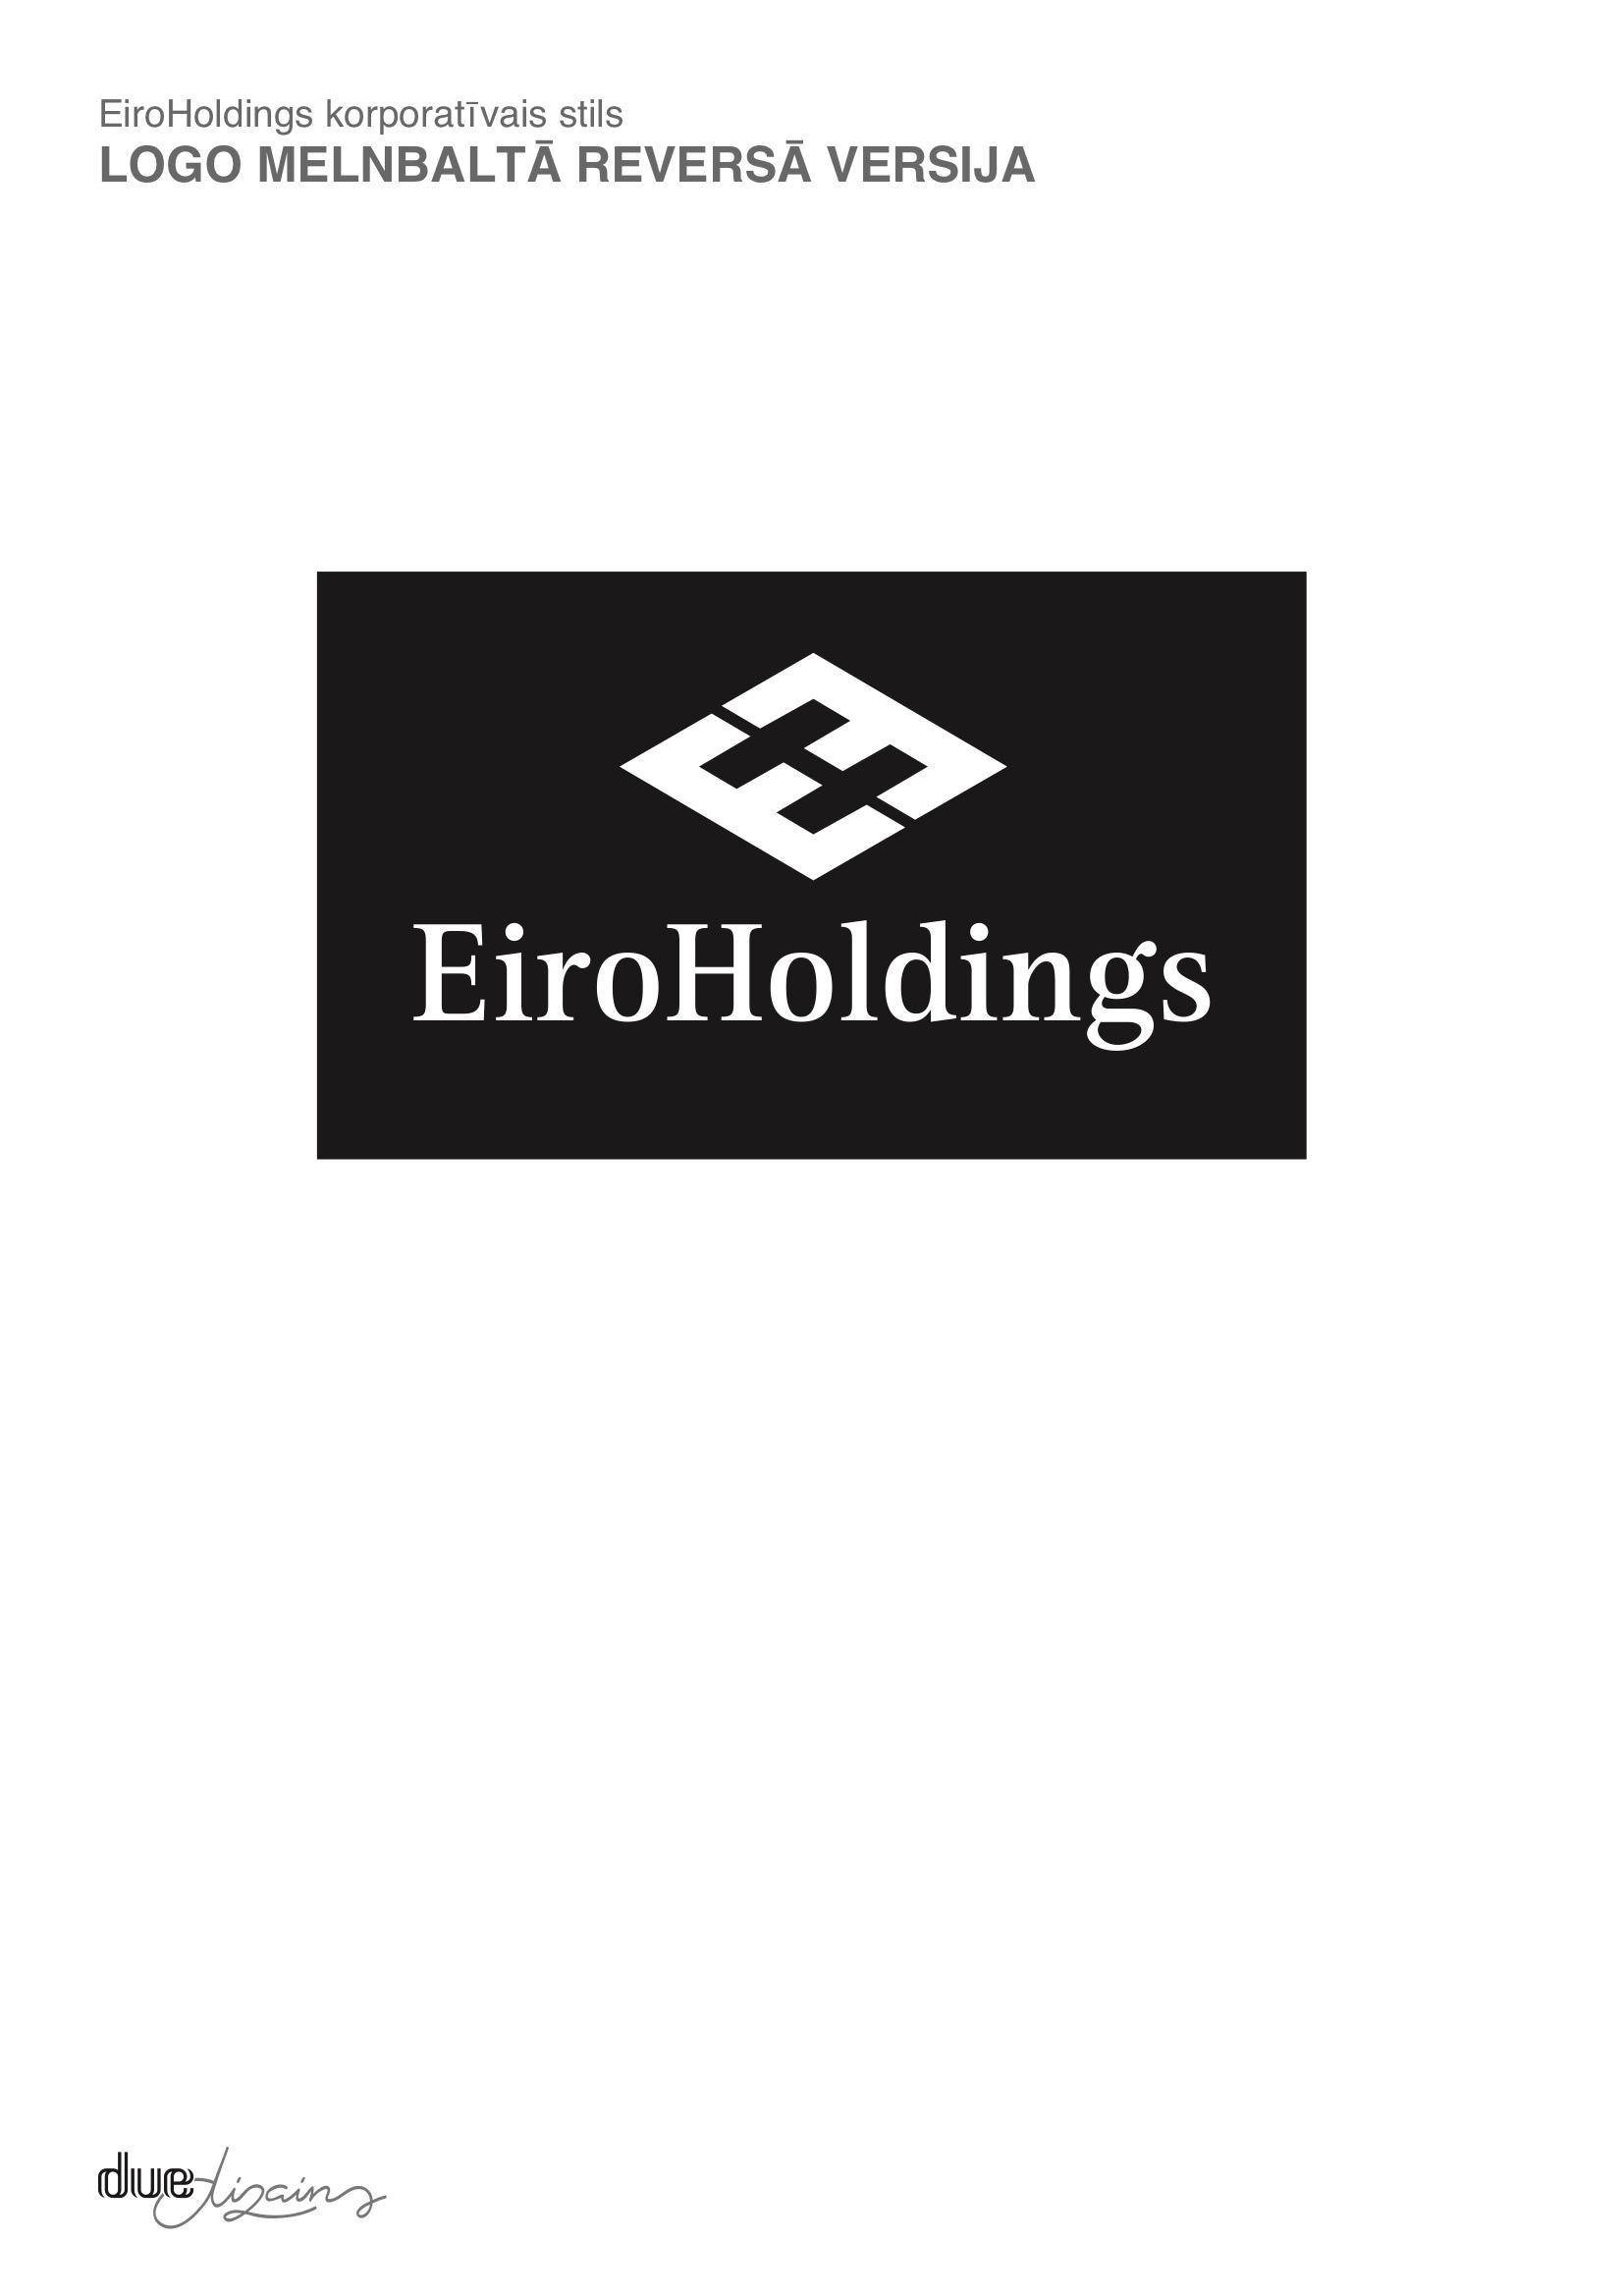 Eiroholdings_logo_guidelines 4